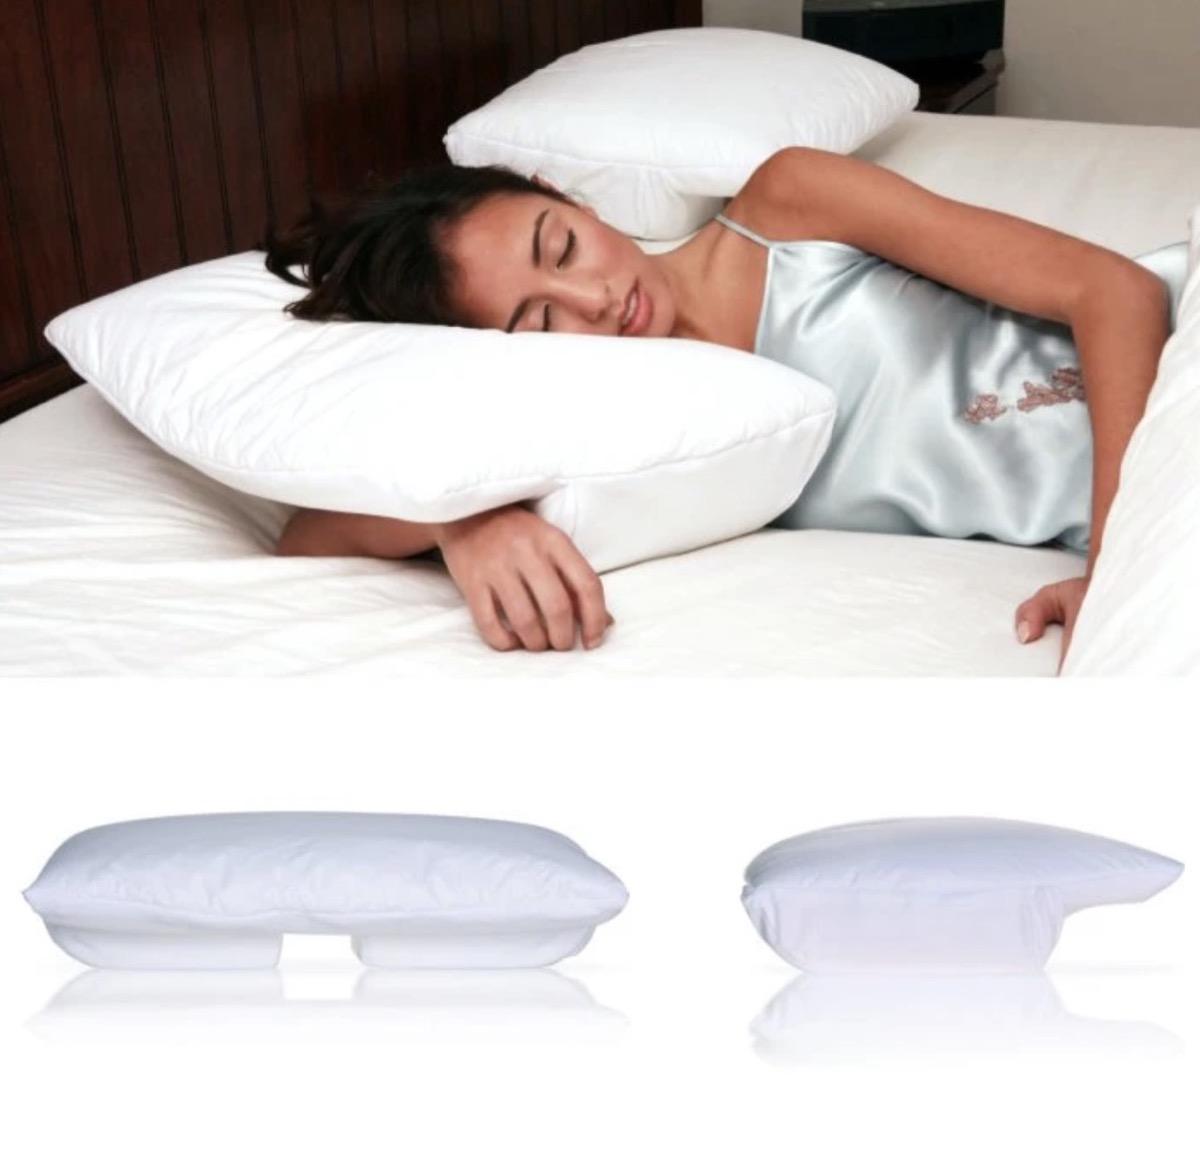 woman sleeping on white pillow, better sleep essentials